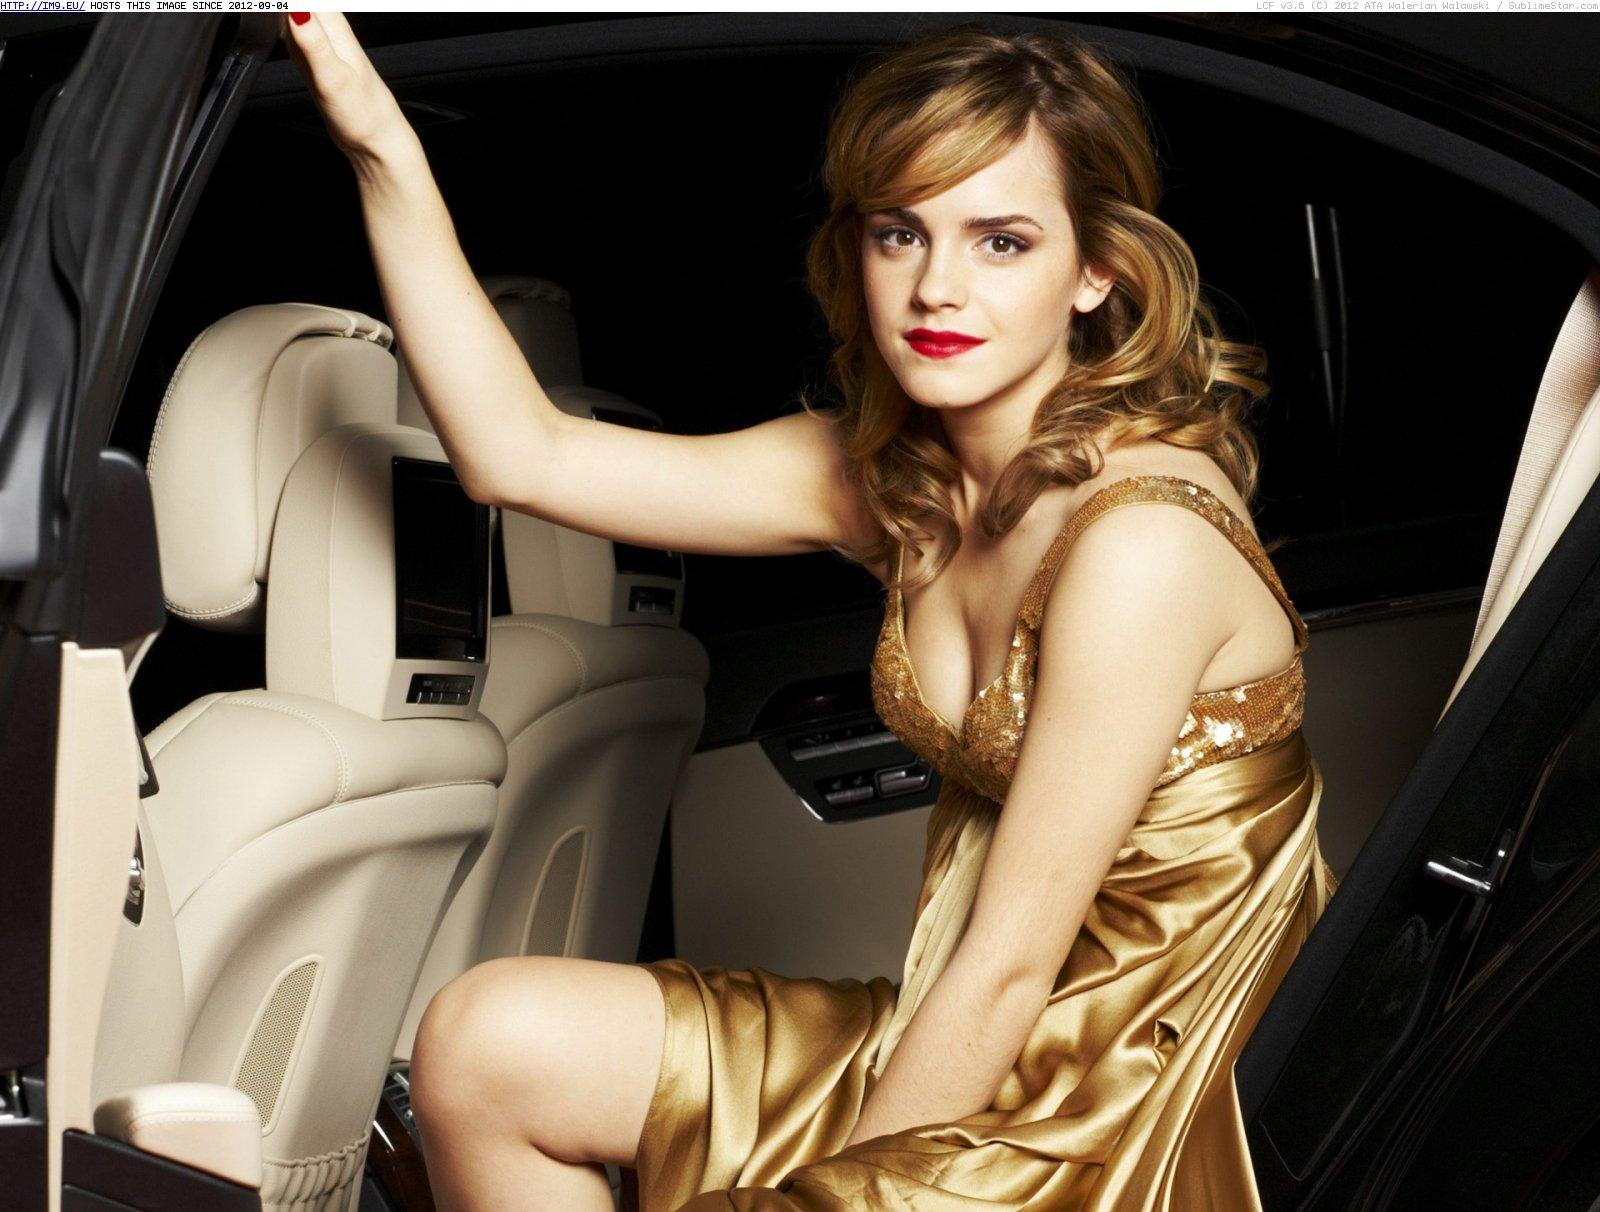 Emma Watson New HD Wallpapers 2013